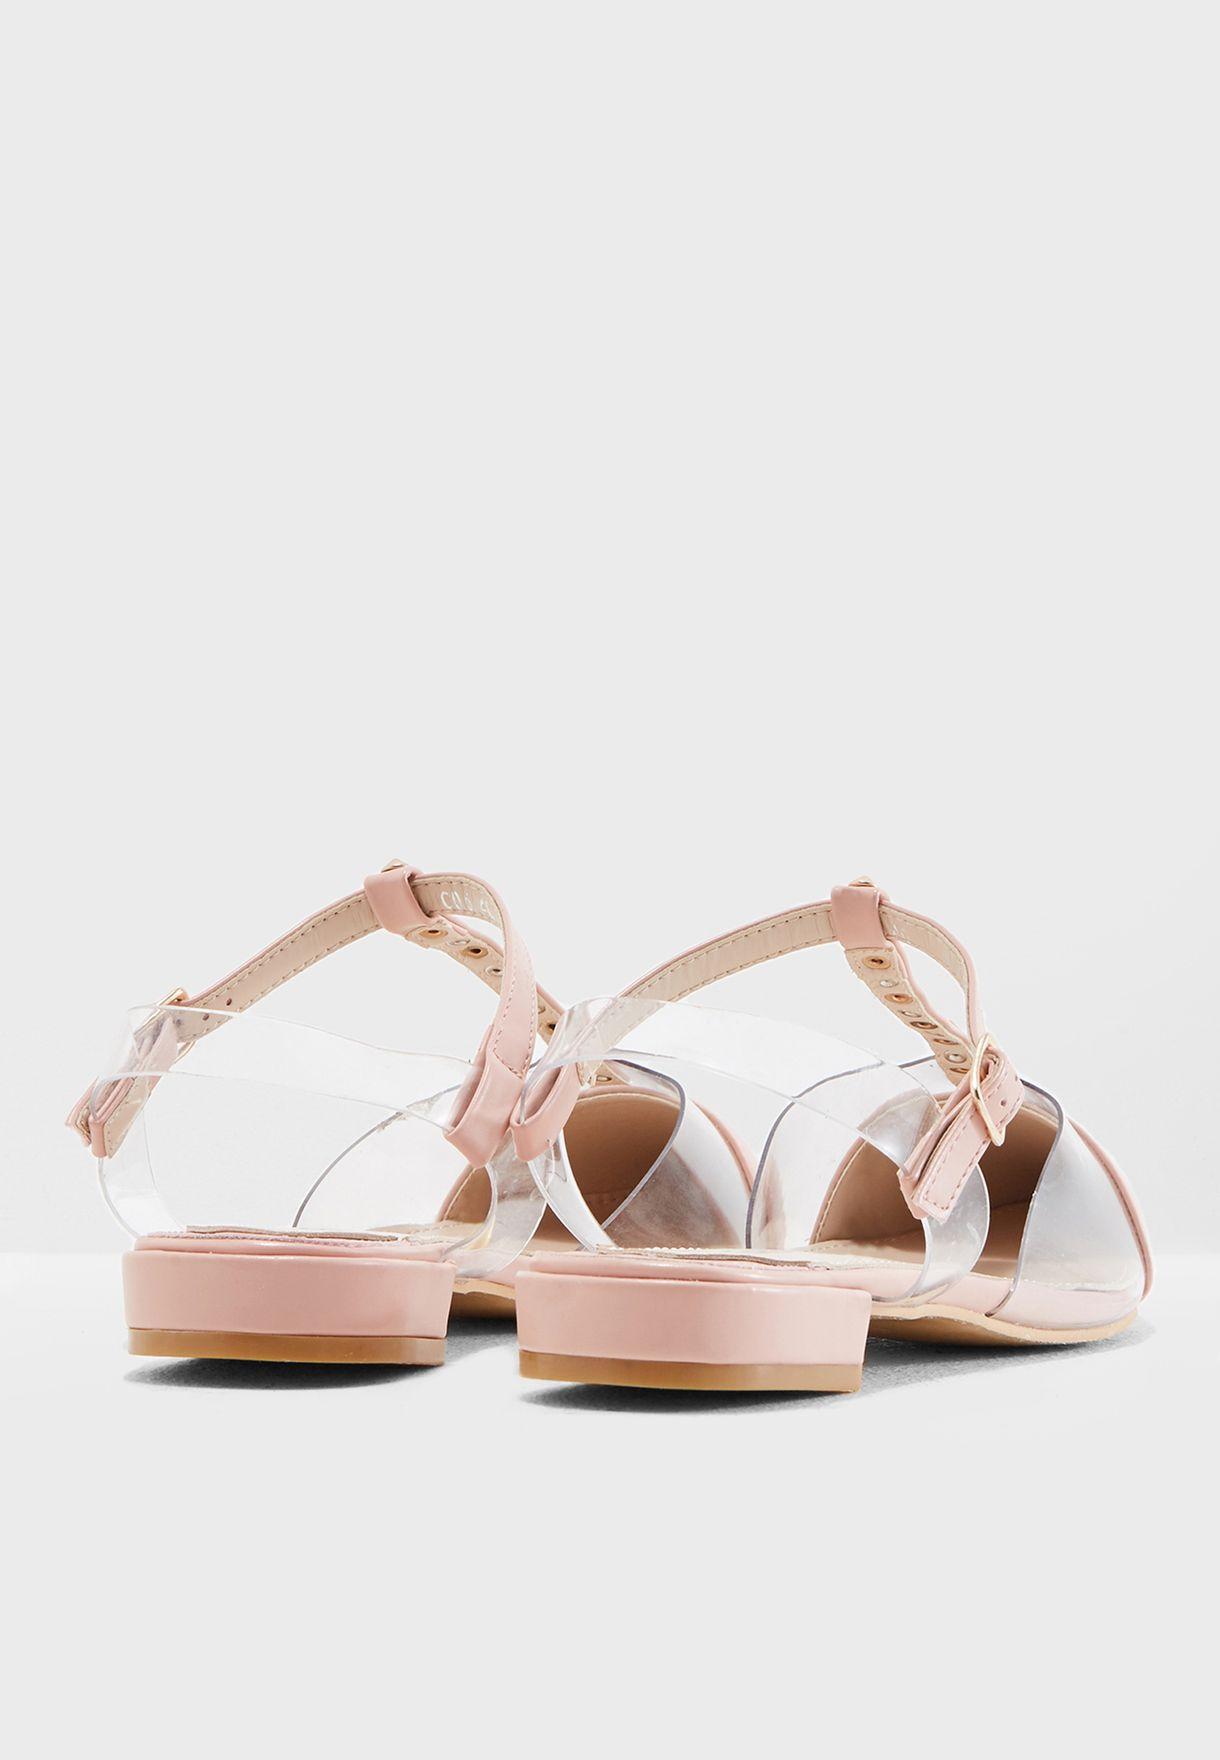 حذاء مزين بدبابيس